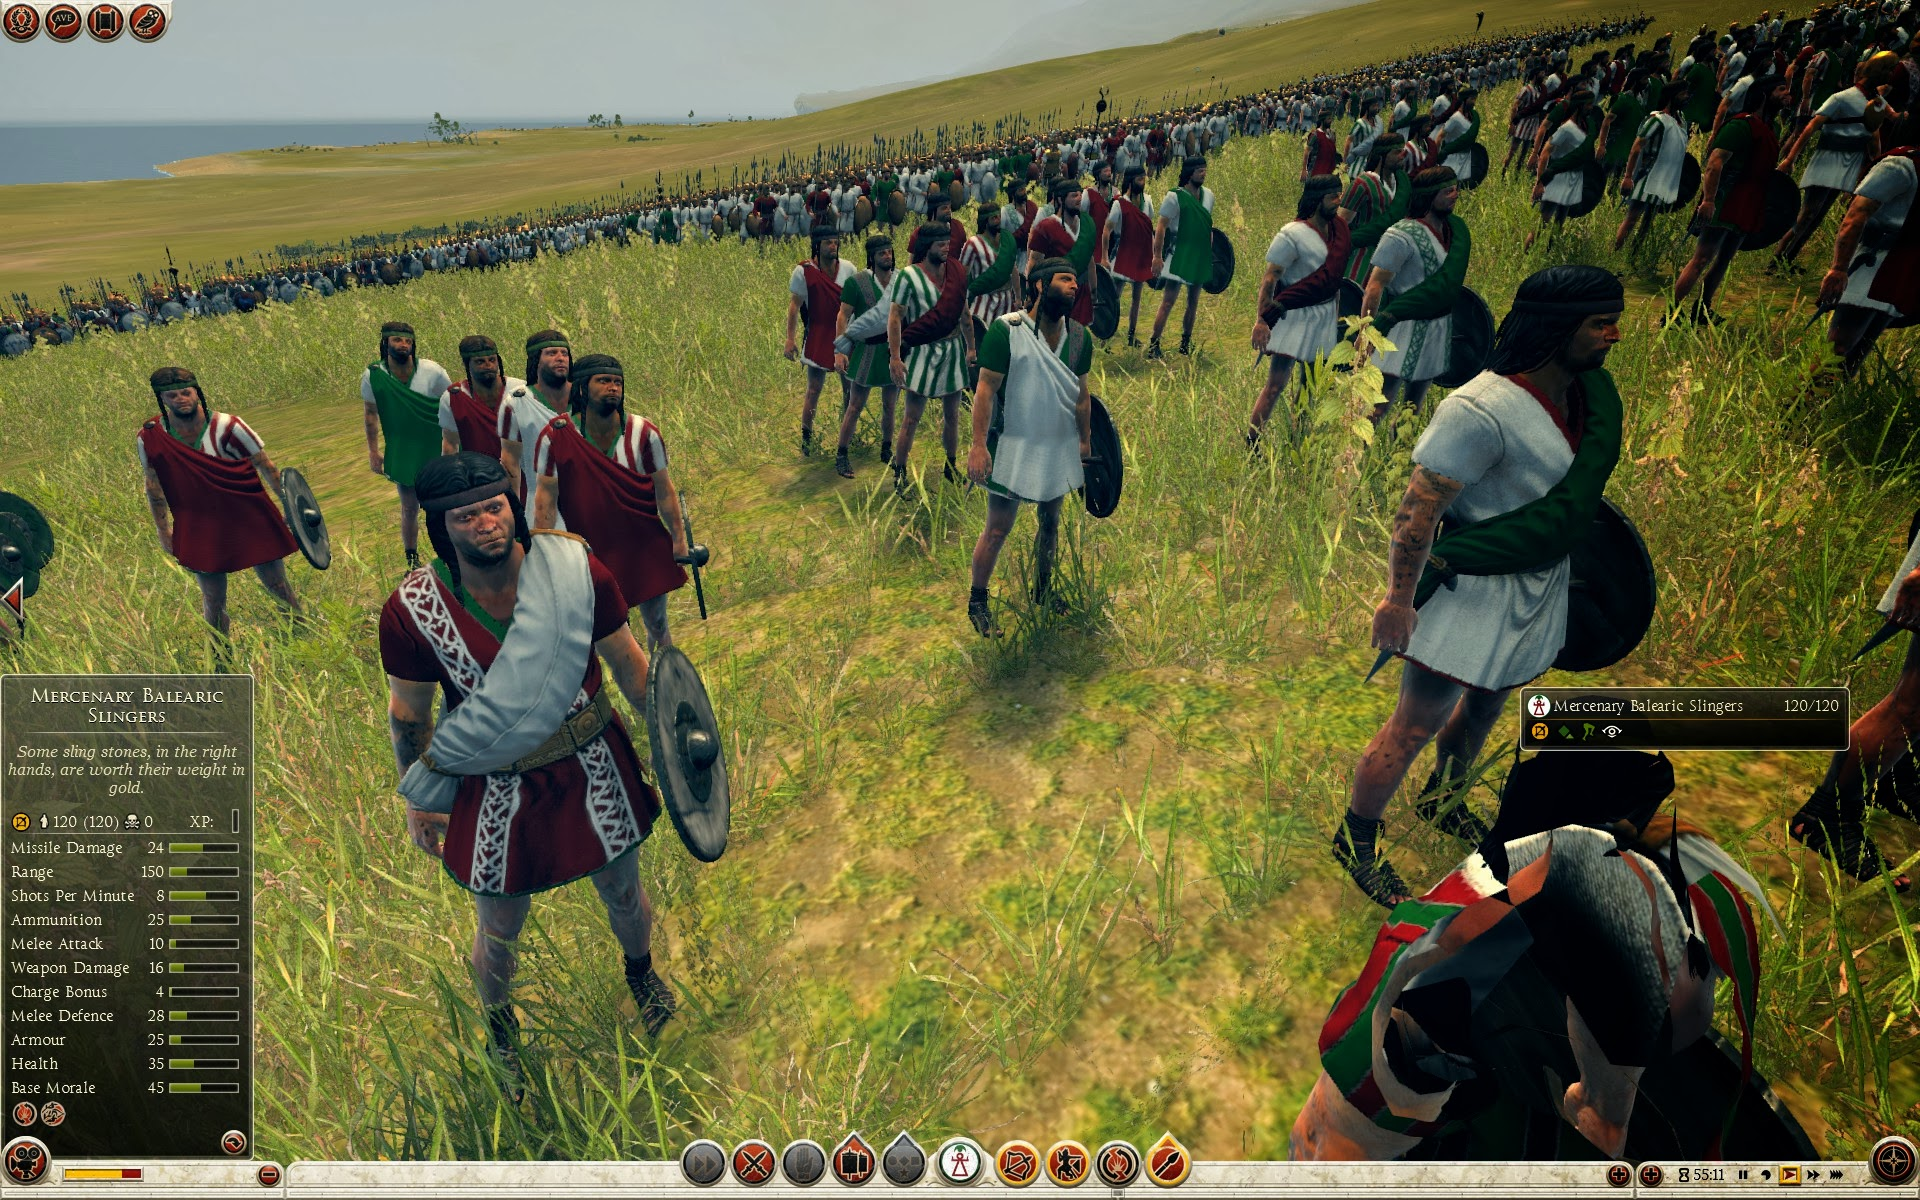 Mercenary Balearic Slingers